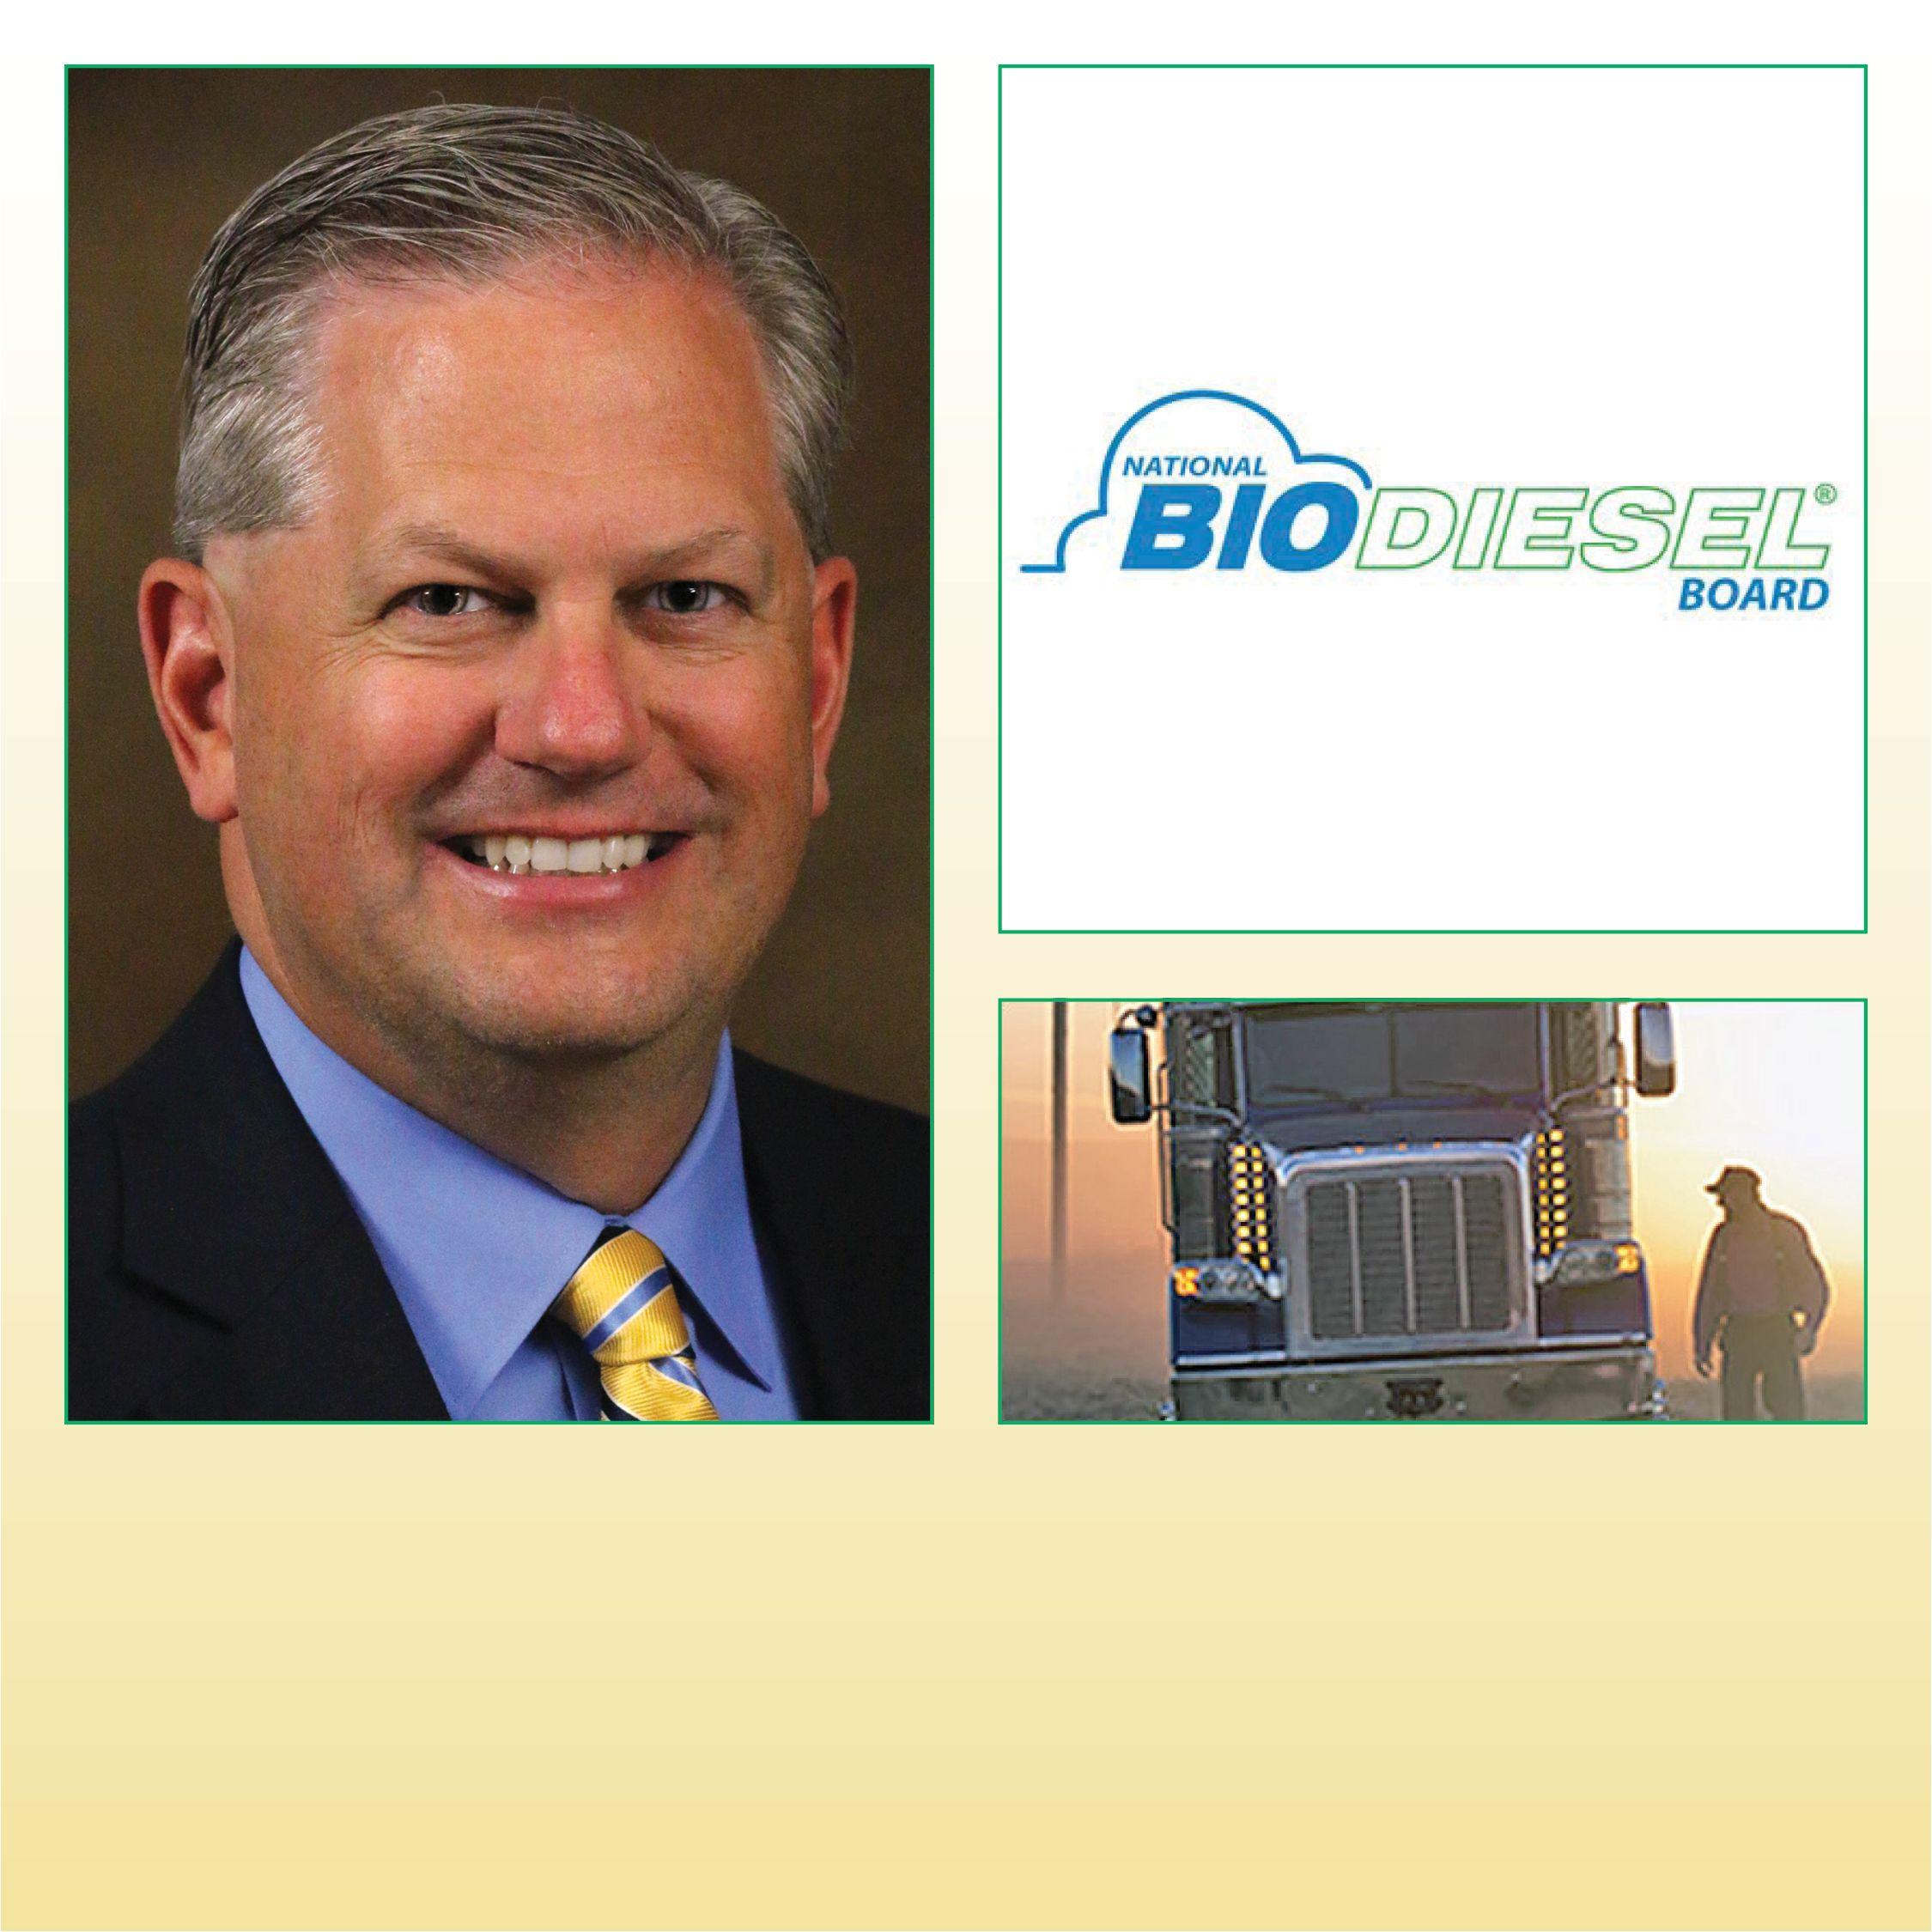 Biodiesel Issues